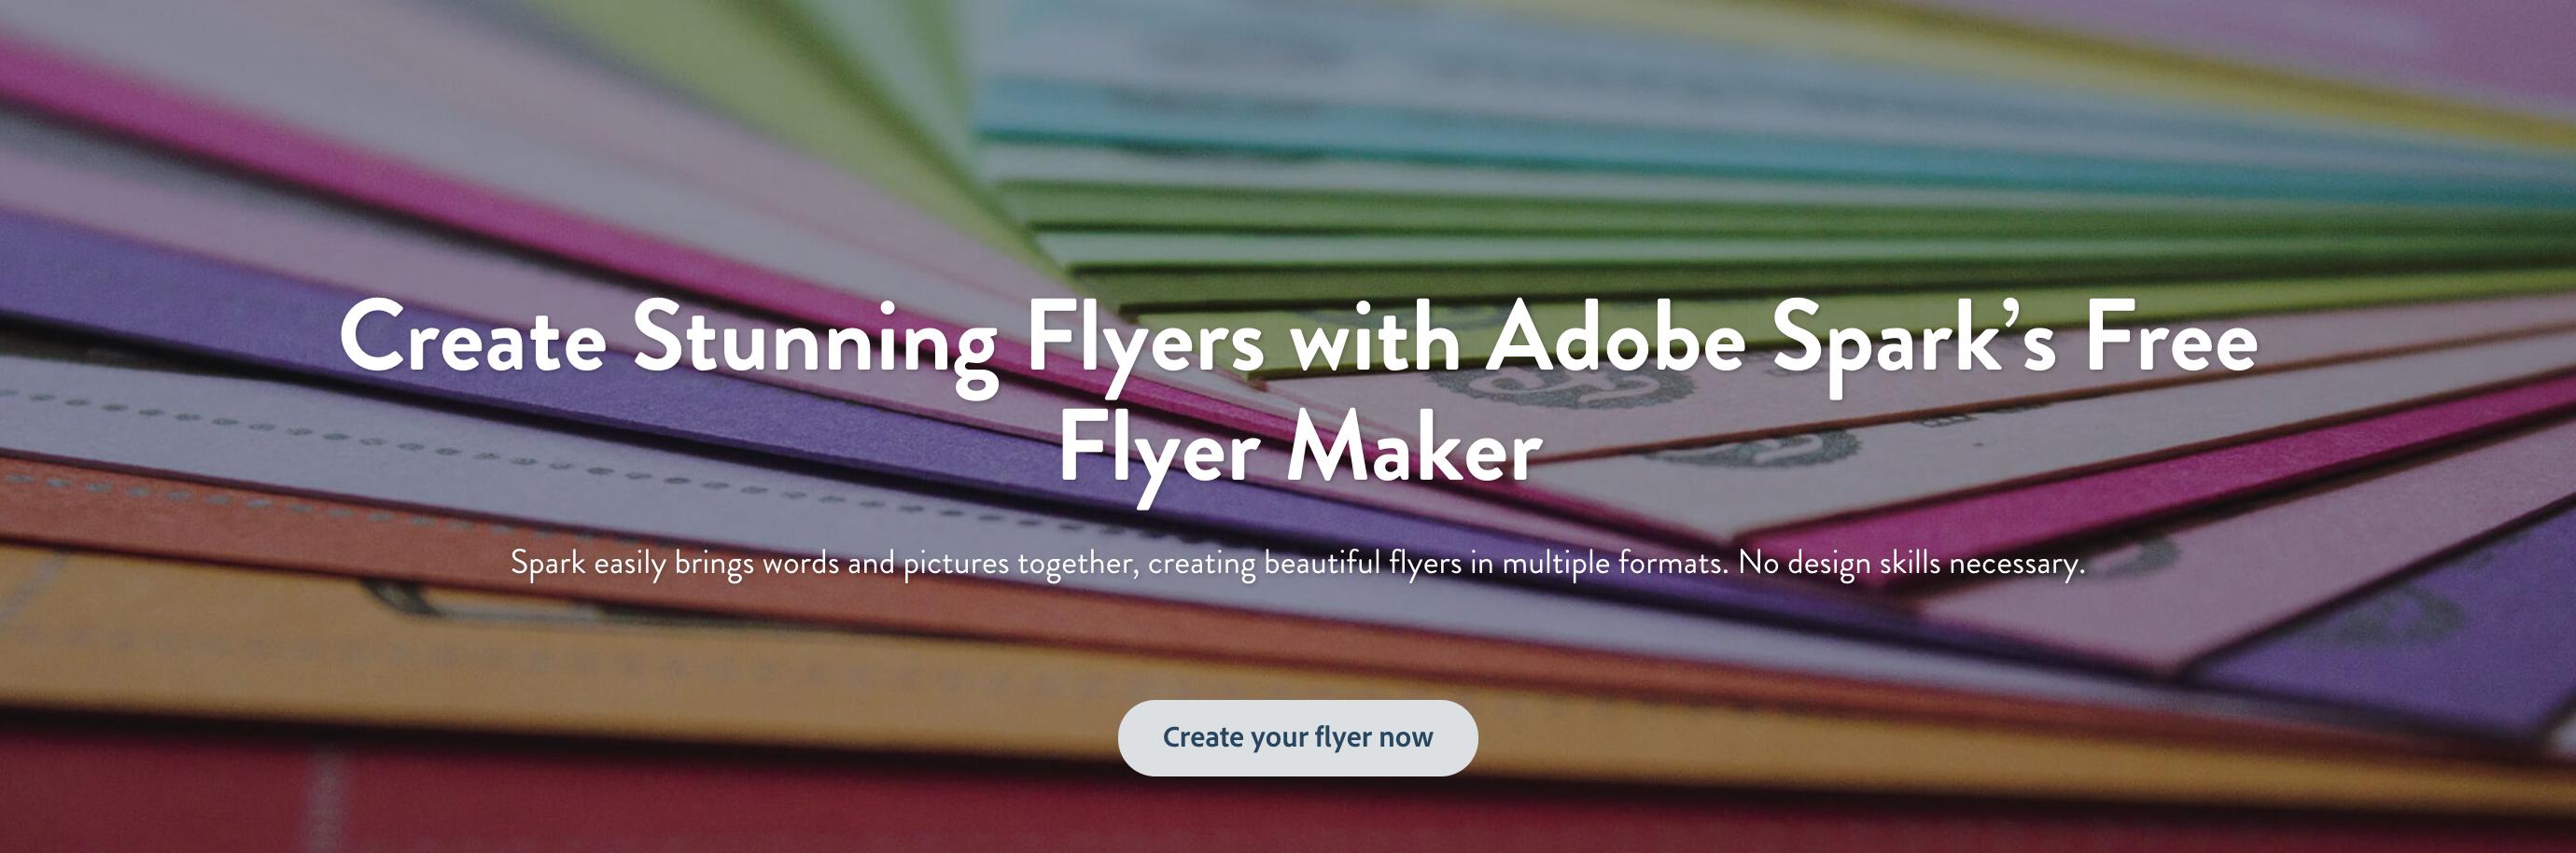 Flyer Maker: Create Beautiful Flyers For Free   Adobe Spark - Free Printable Flyer Maker Online